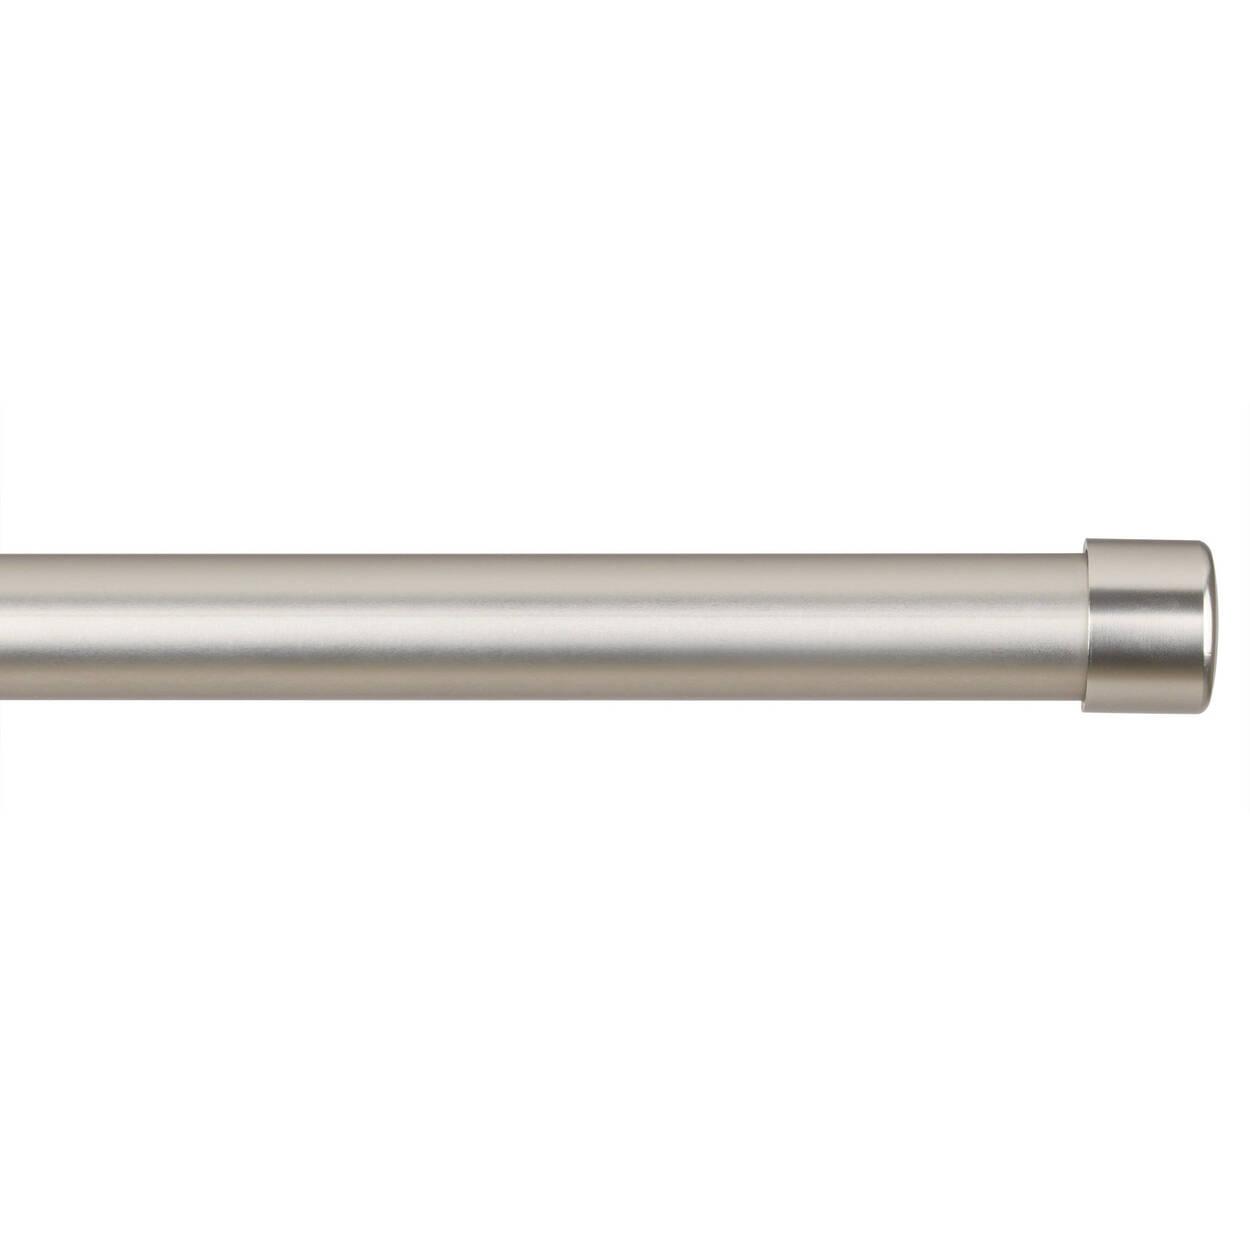 Curtain Rod Set - Diameter 16/19 mm